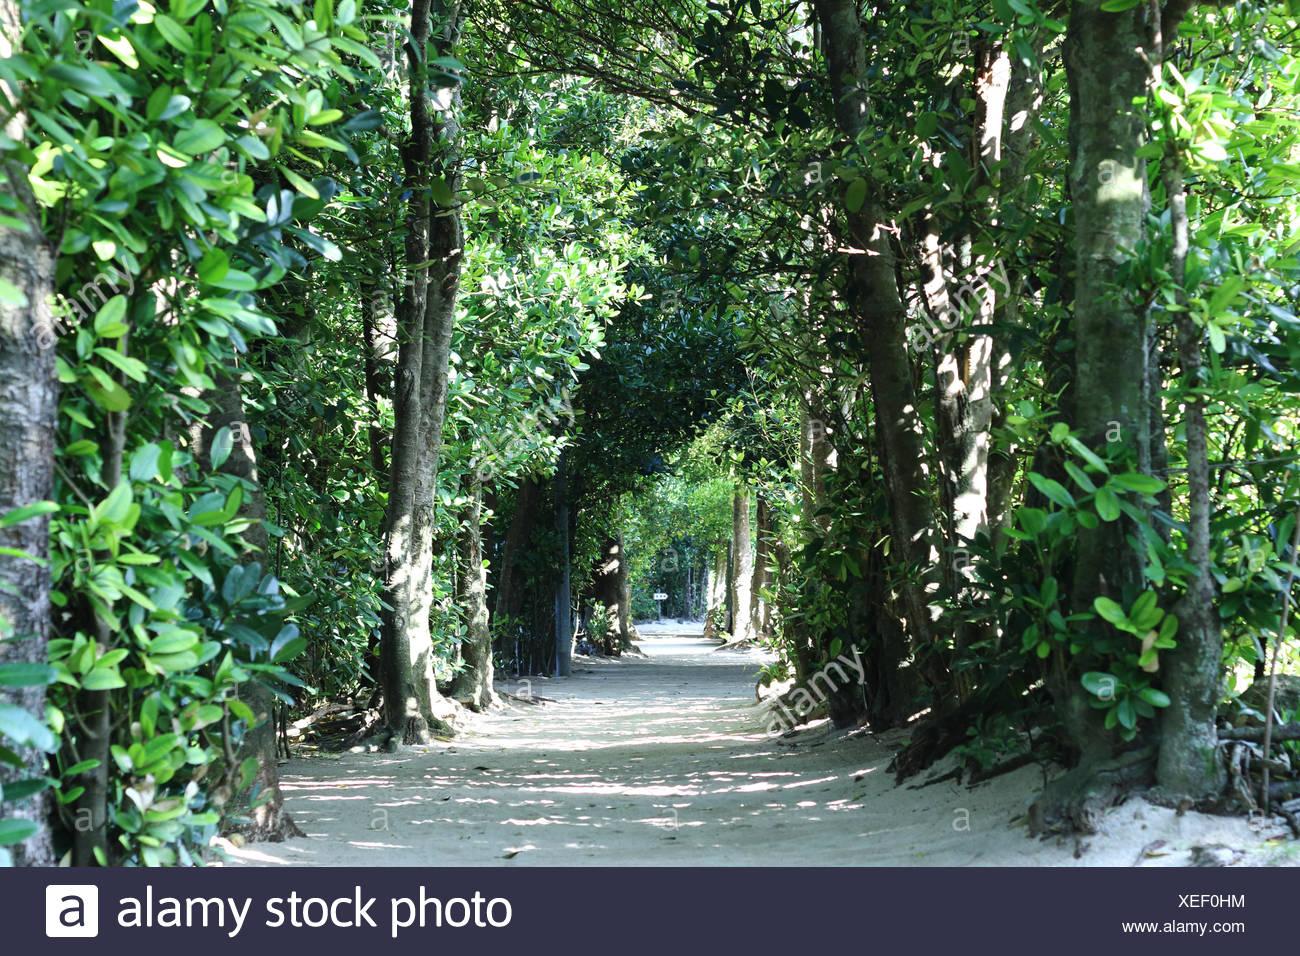 Japan, Tree lined path - Stock Image